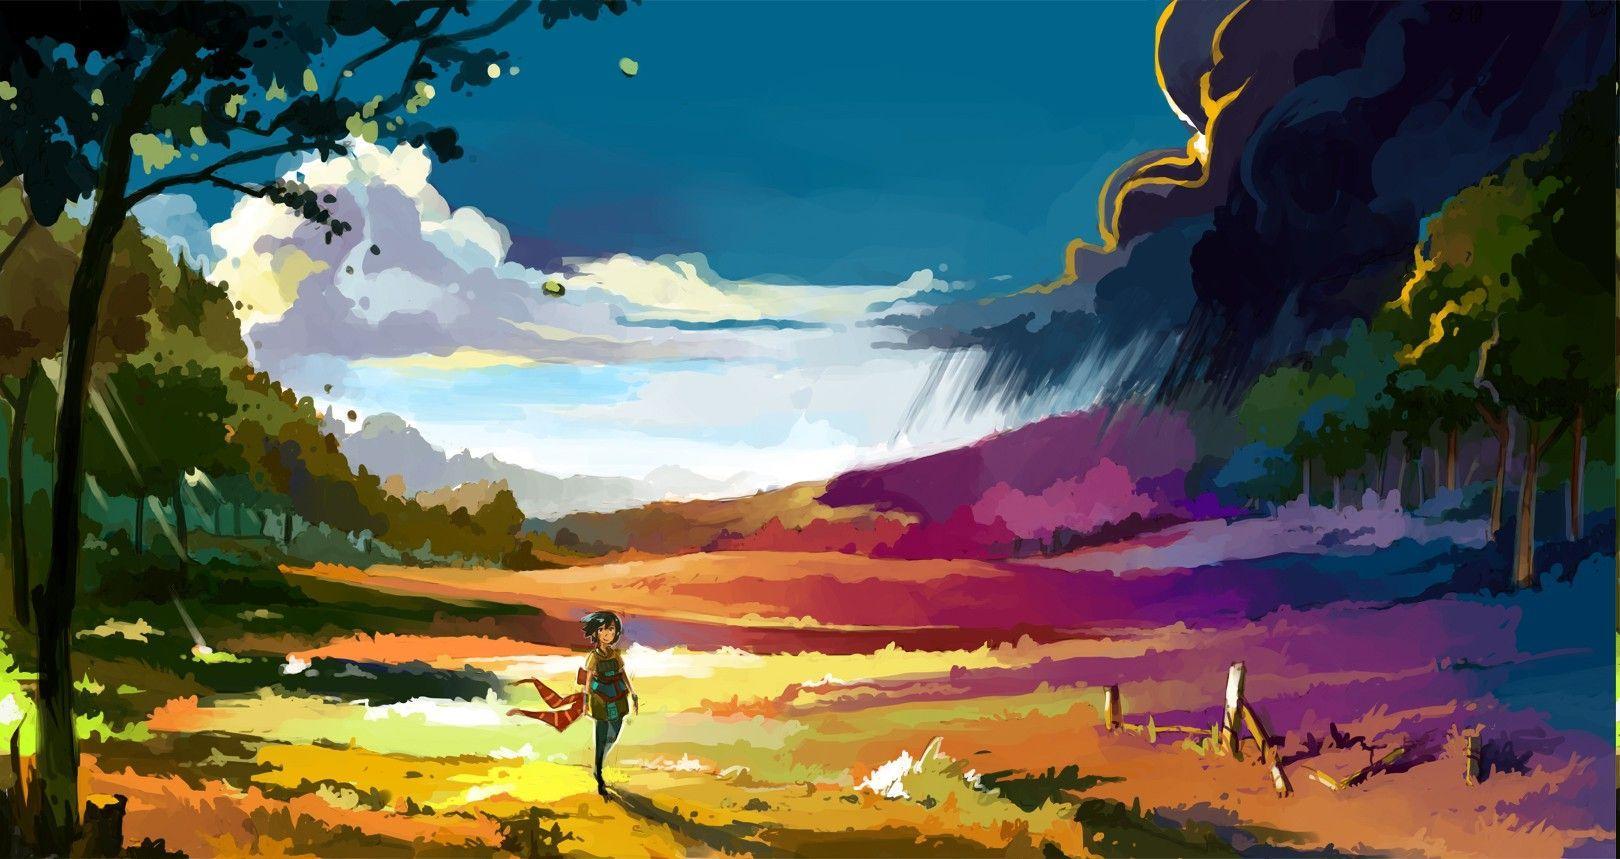 Anime Landscape Wallpapers - Top Free Anime Landscape ...